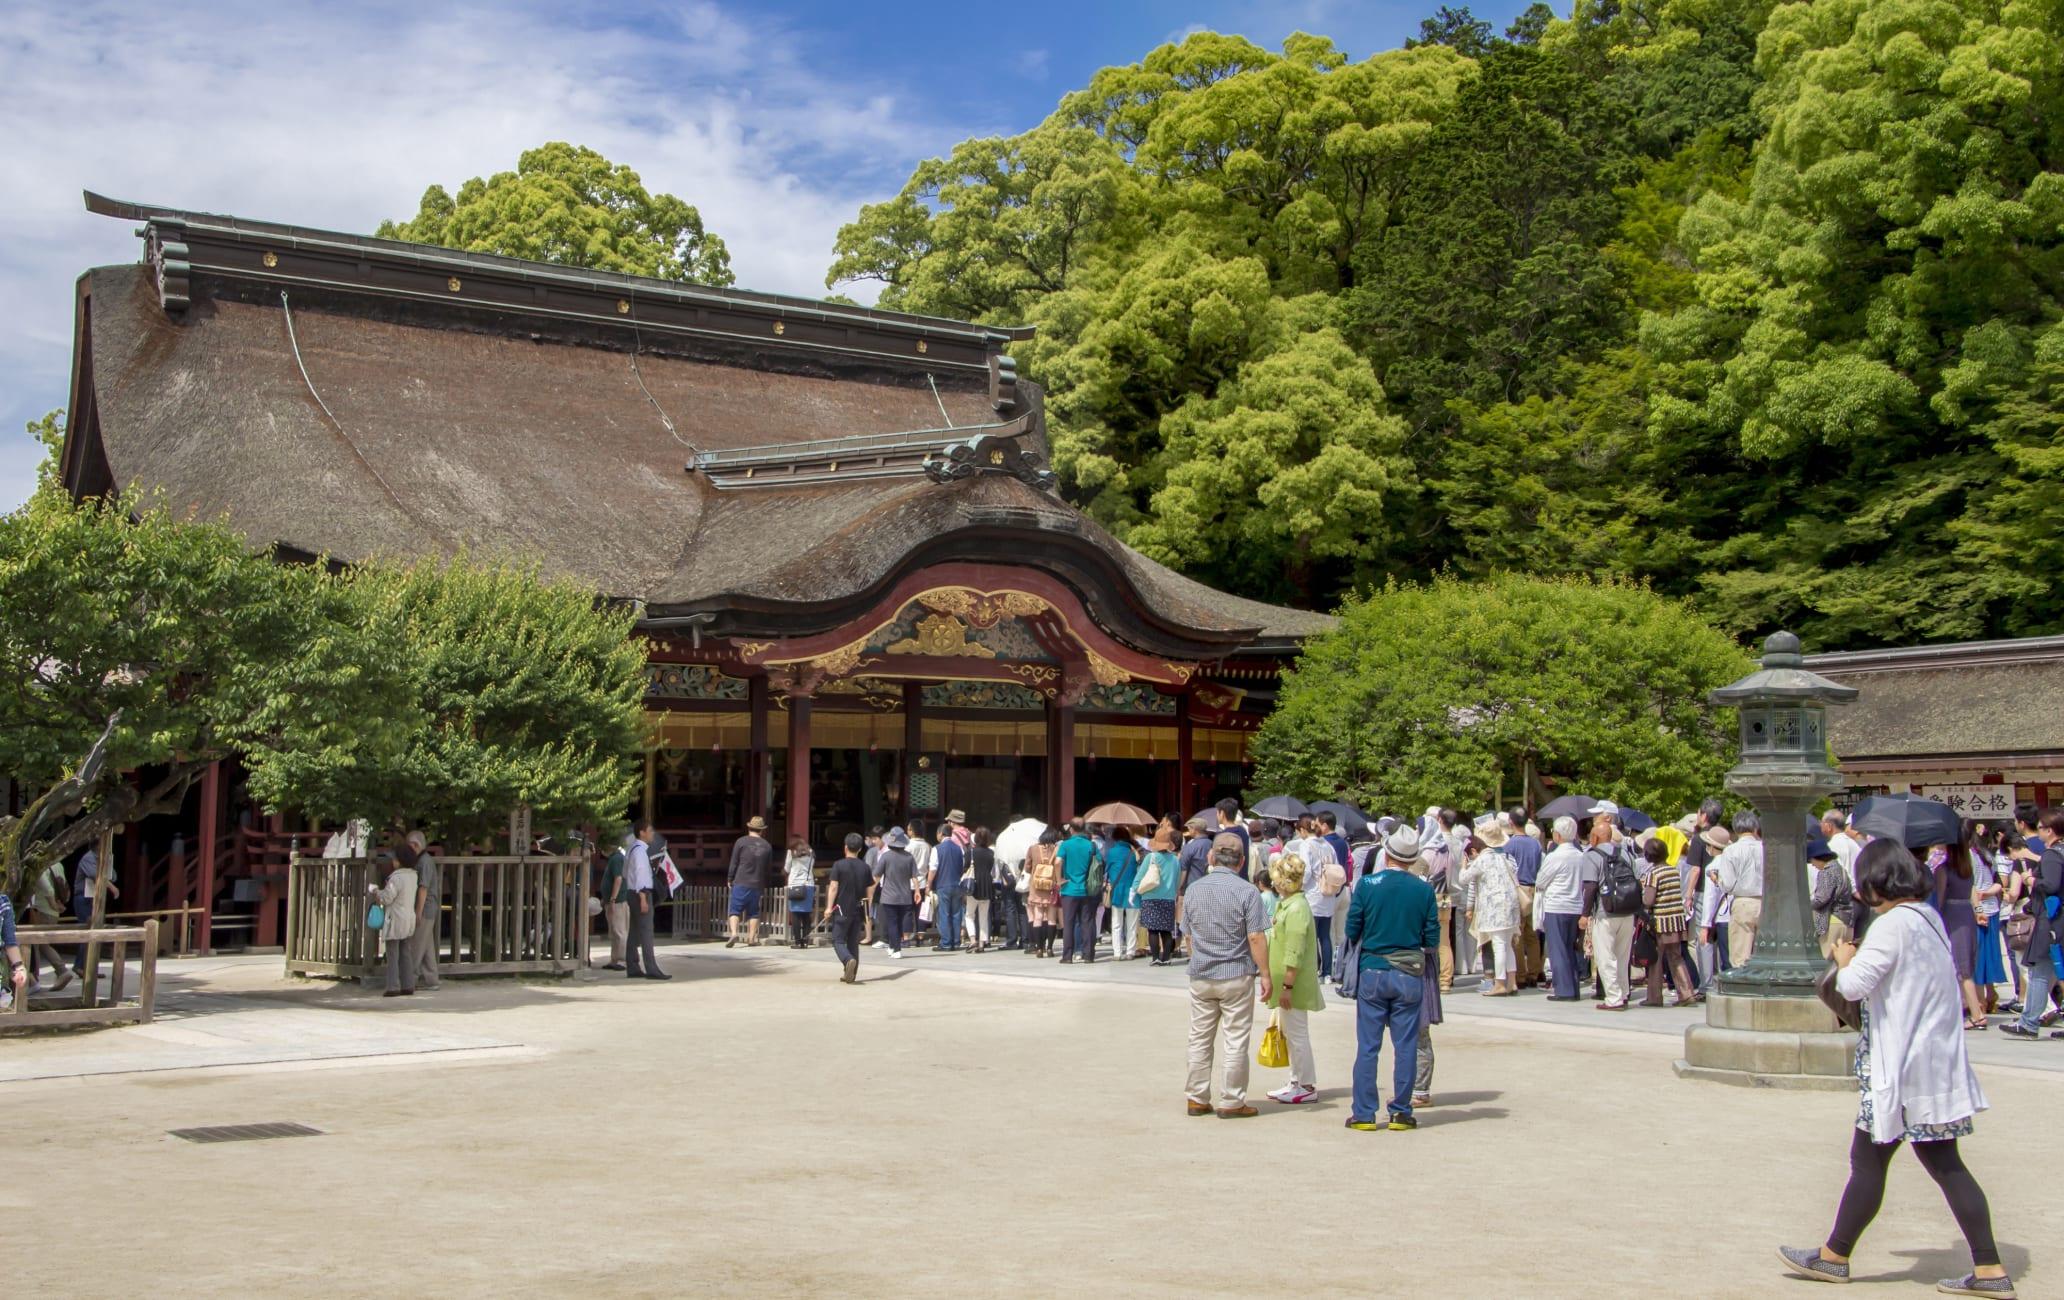 Dazaifu Tenman-gu Shrine